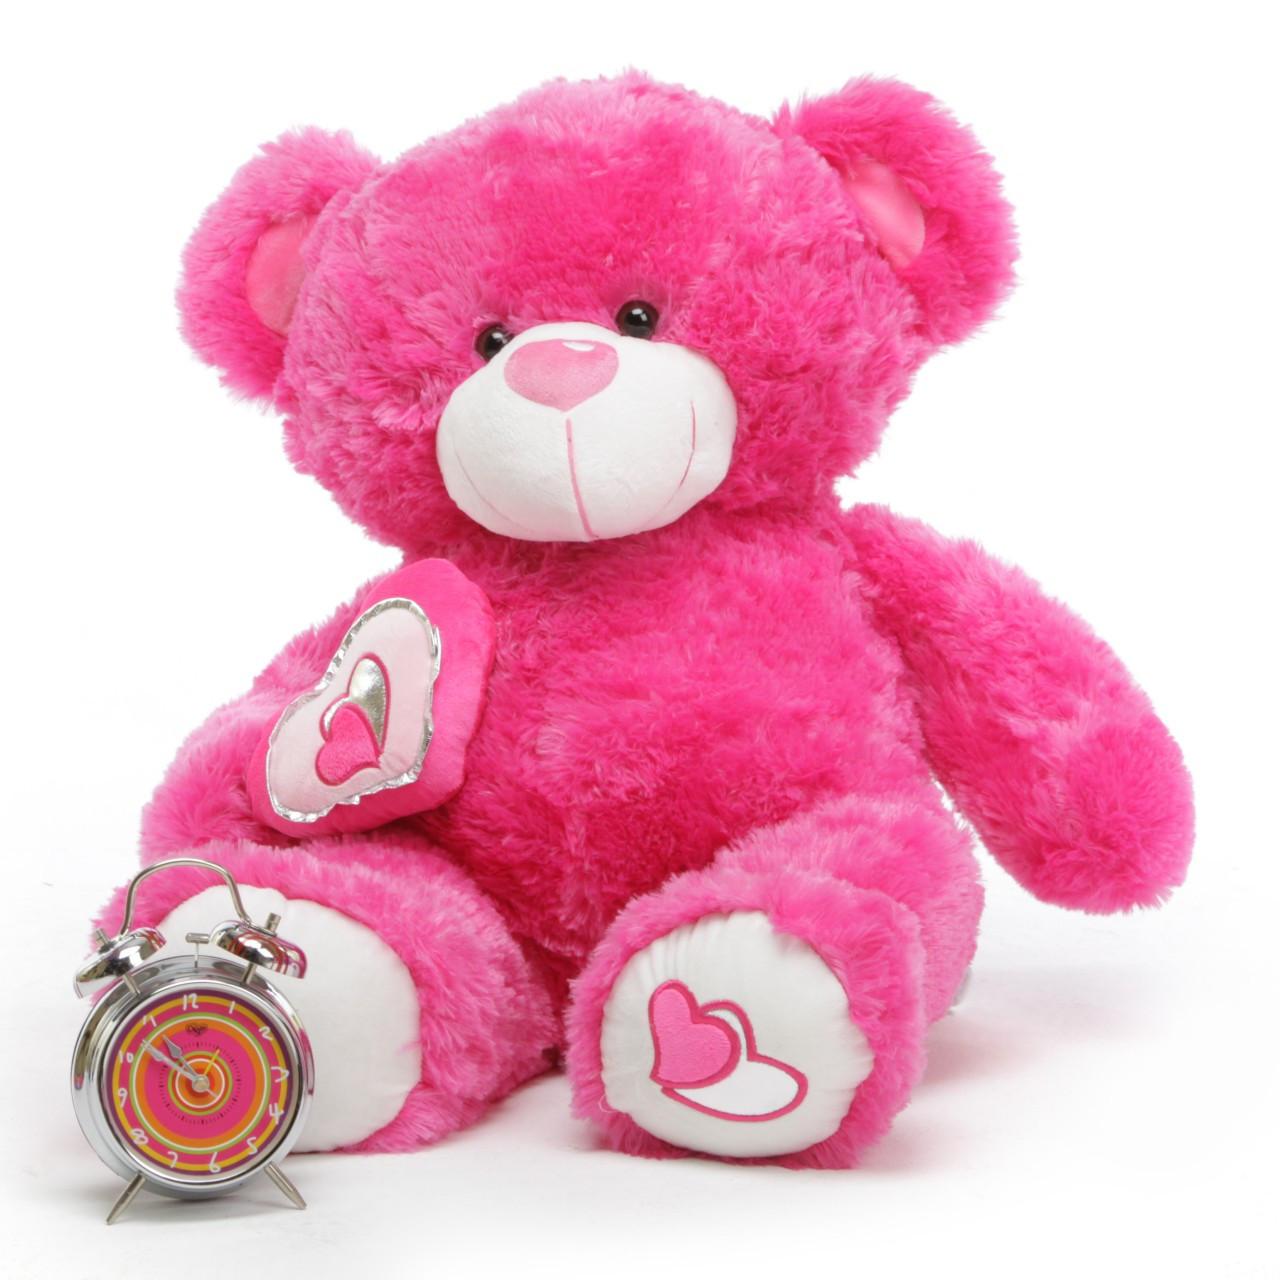 ChaCha Big Love 30 Hot Pink Valentine Teddy Bear Giant